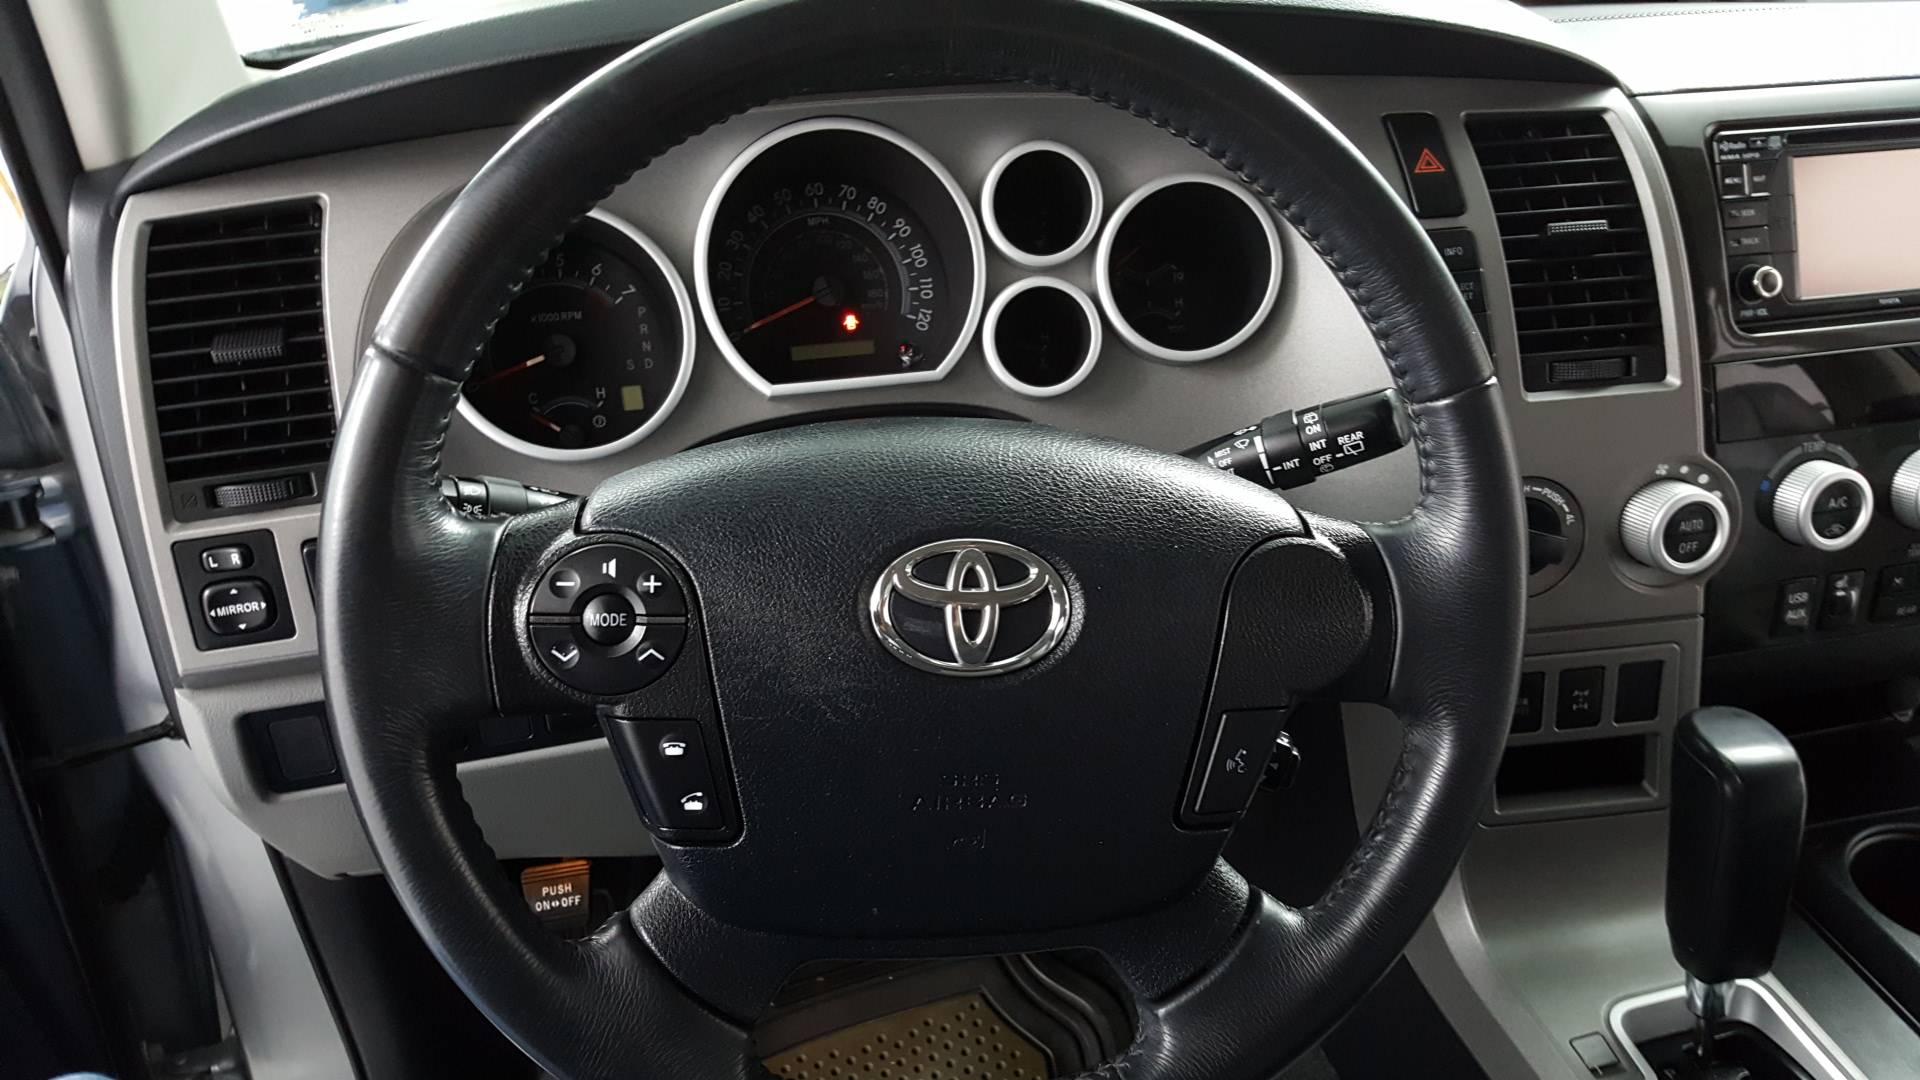 2013 Toyota Sequoia Sport Utility